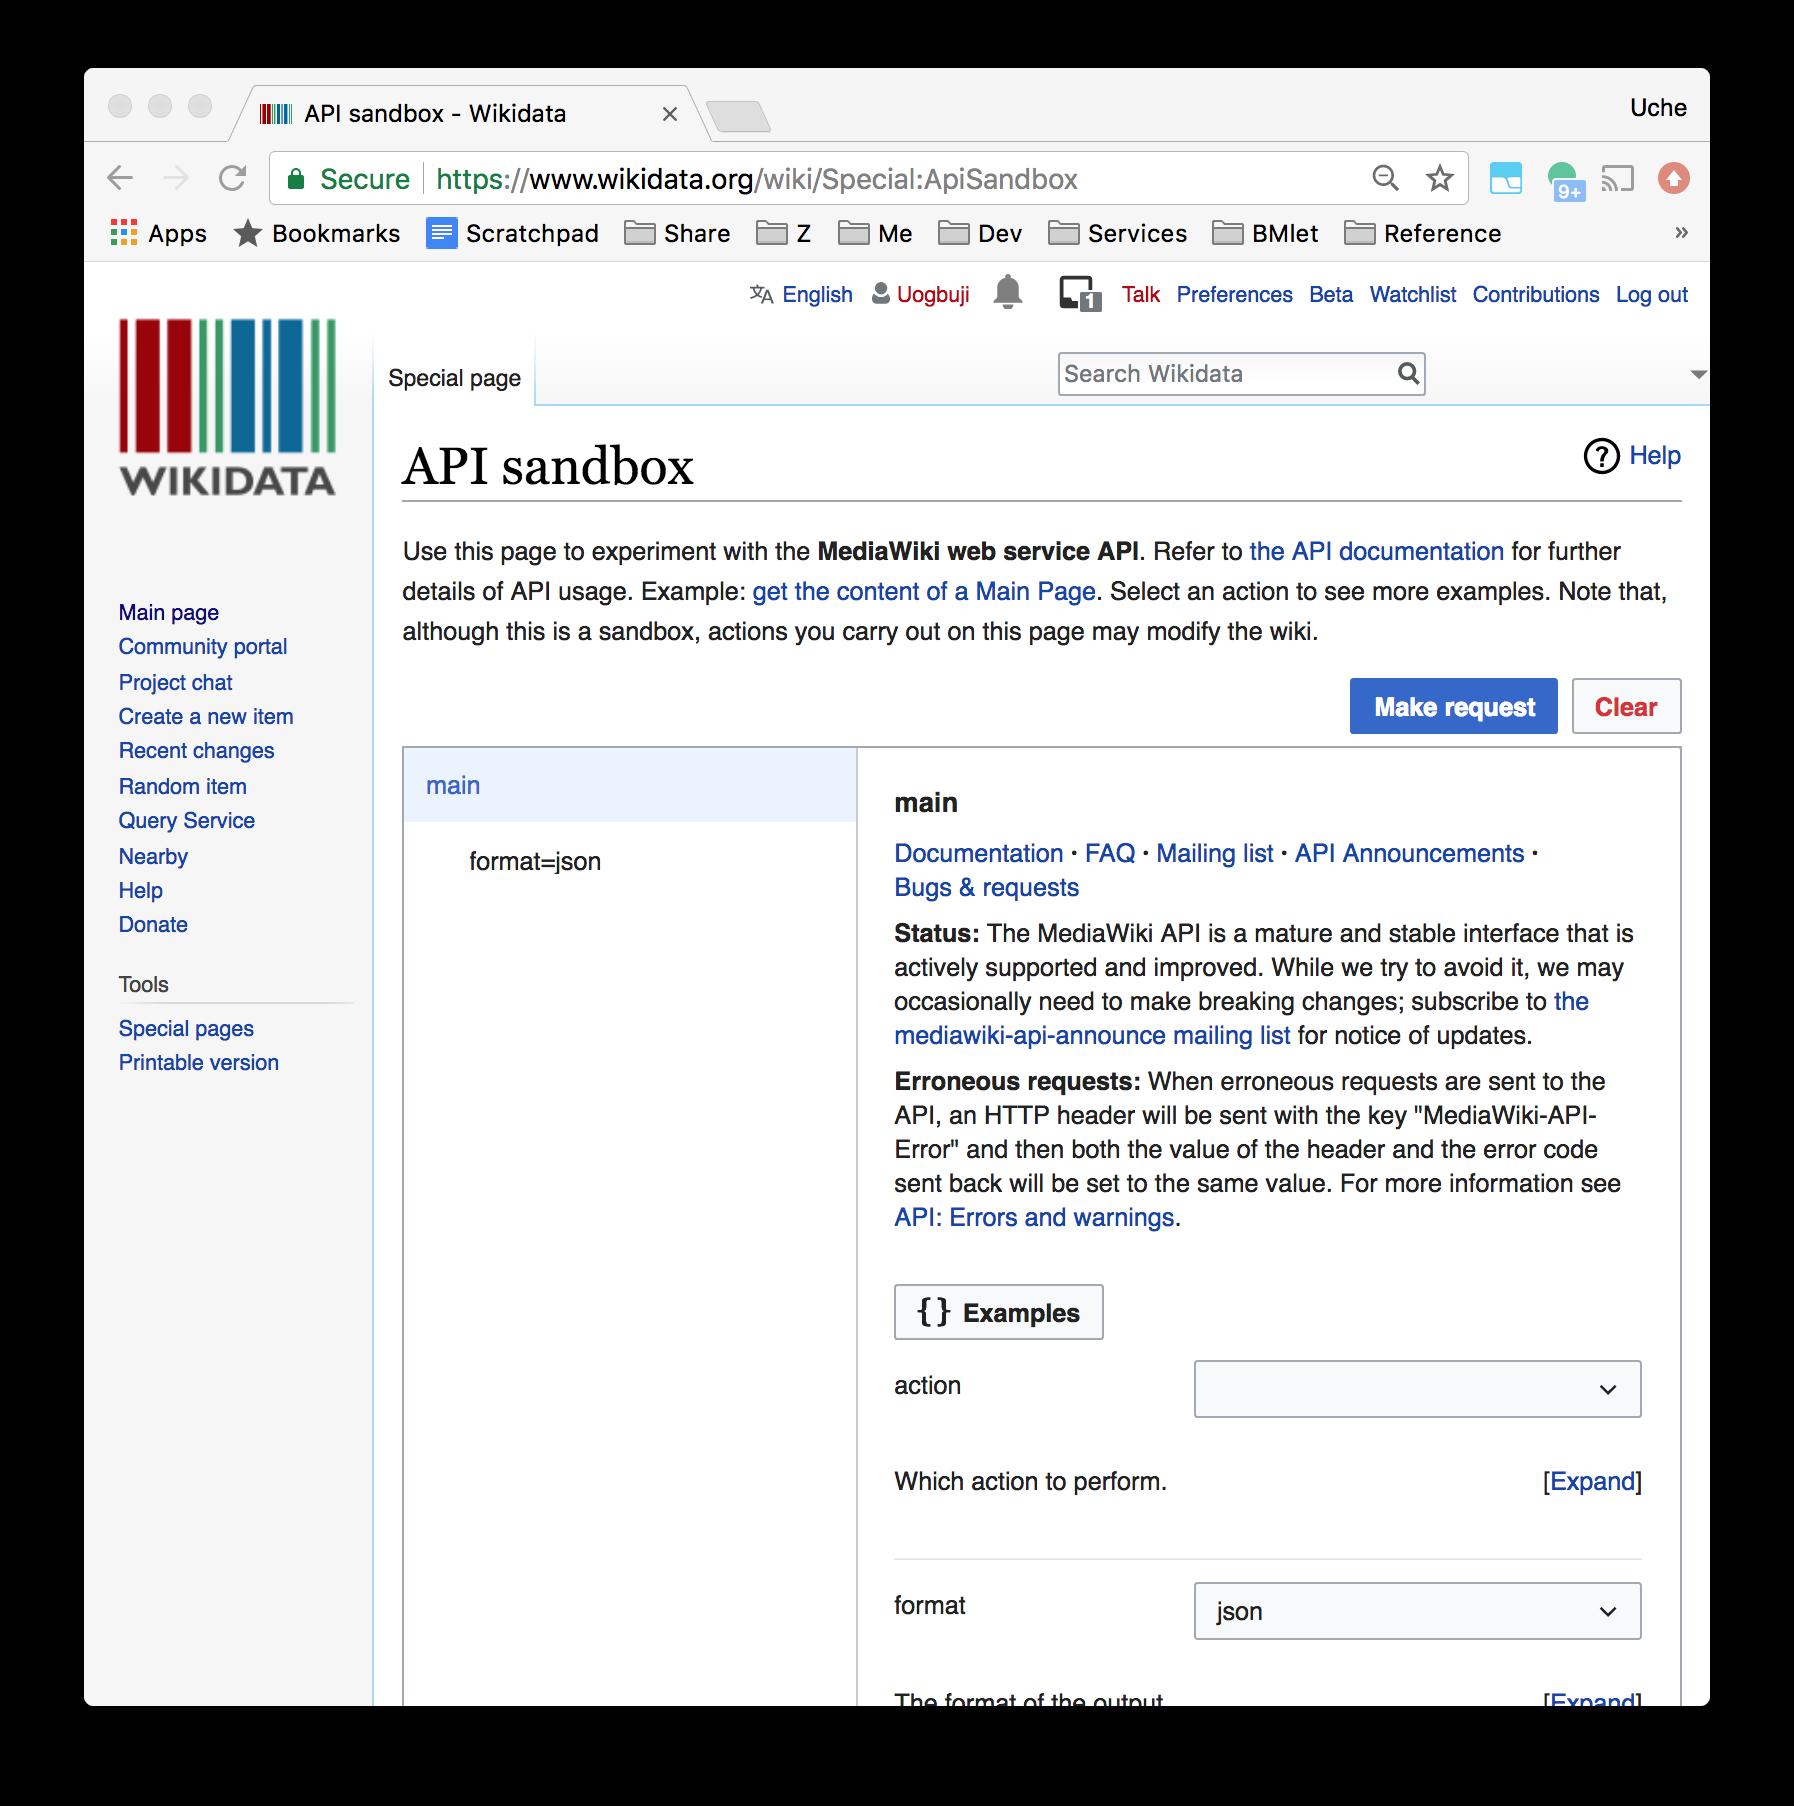 wikidata-api-sandbox1